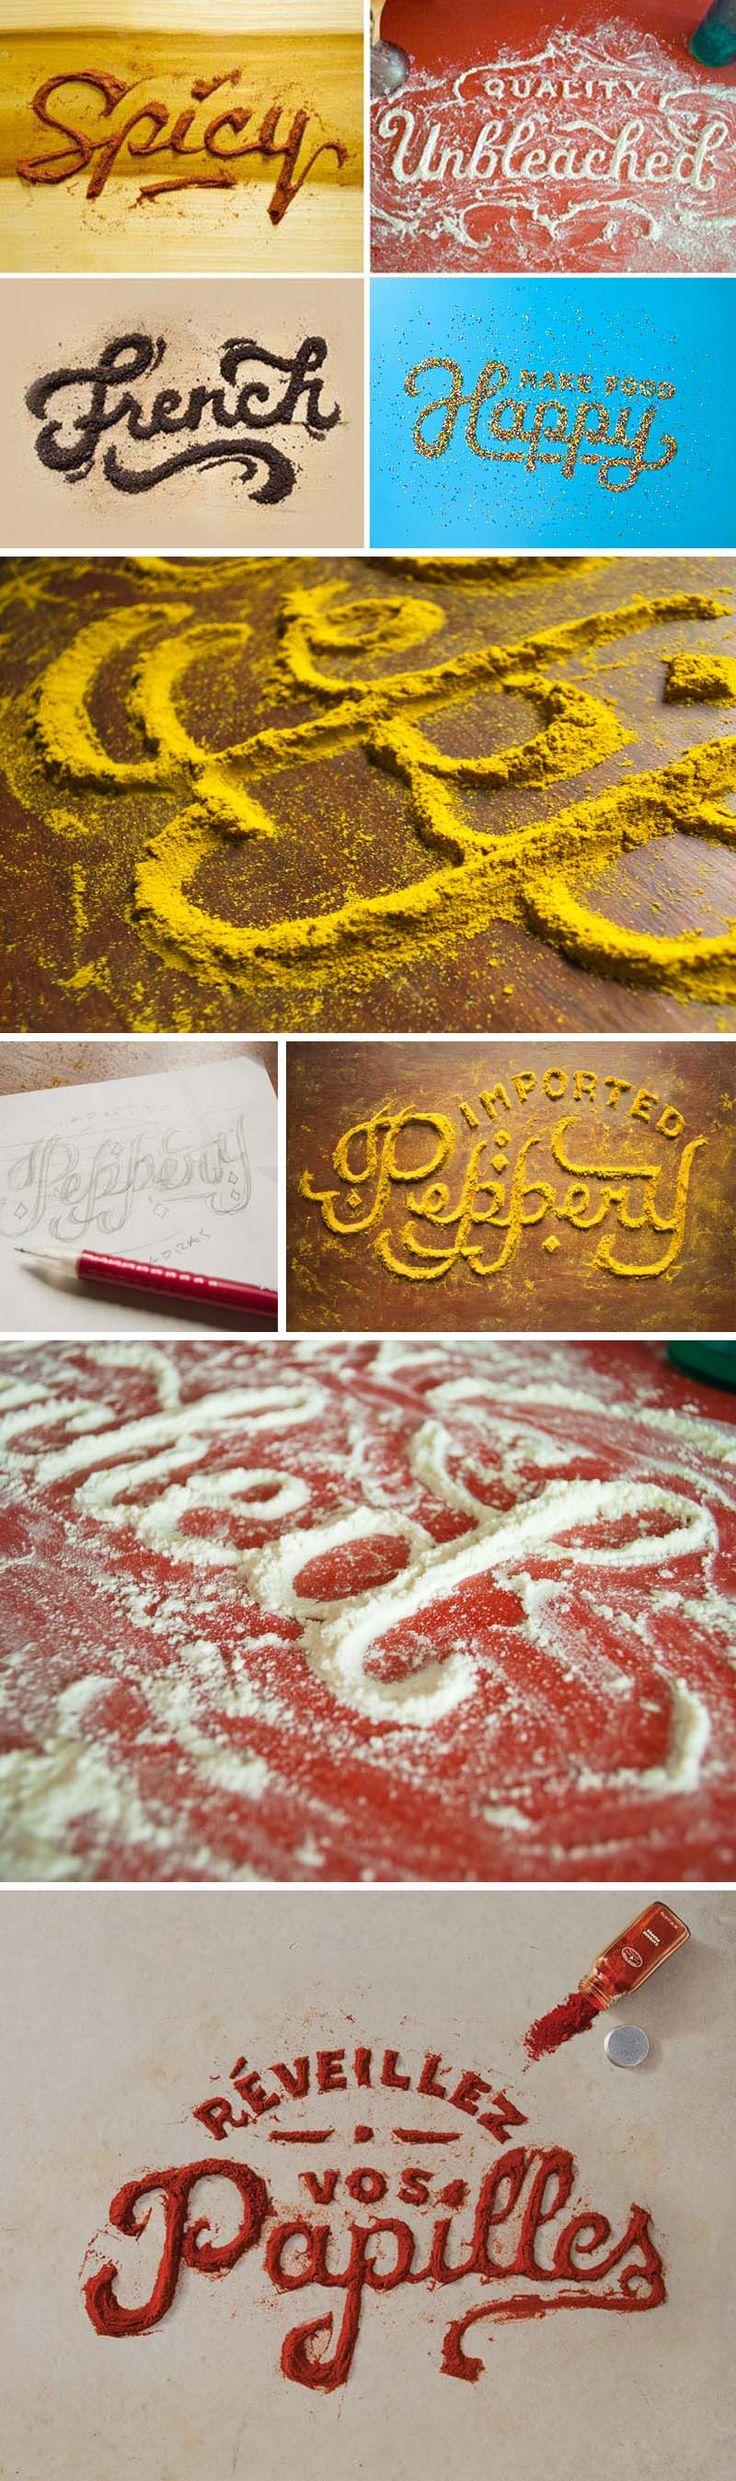 FOOD TYPOGRAPHY.